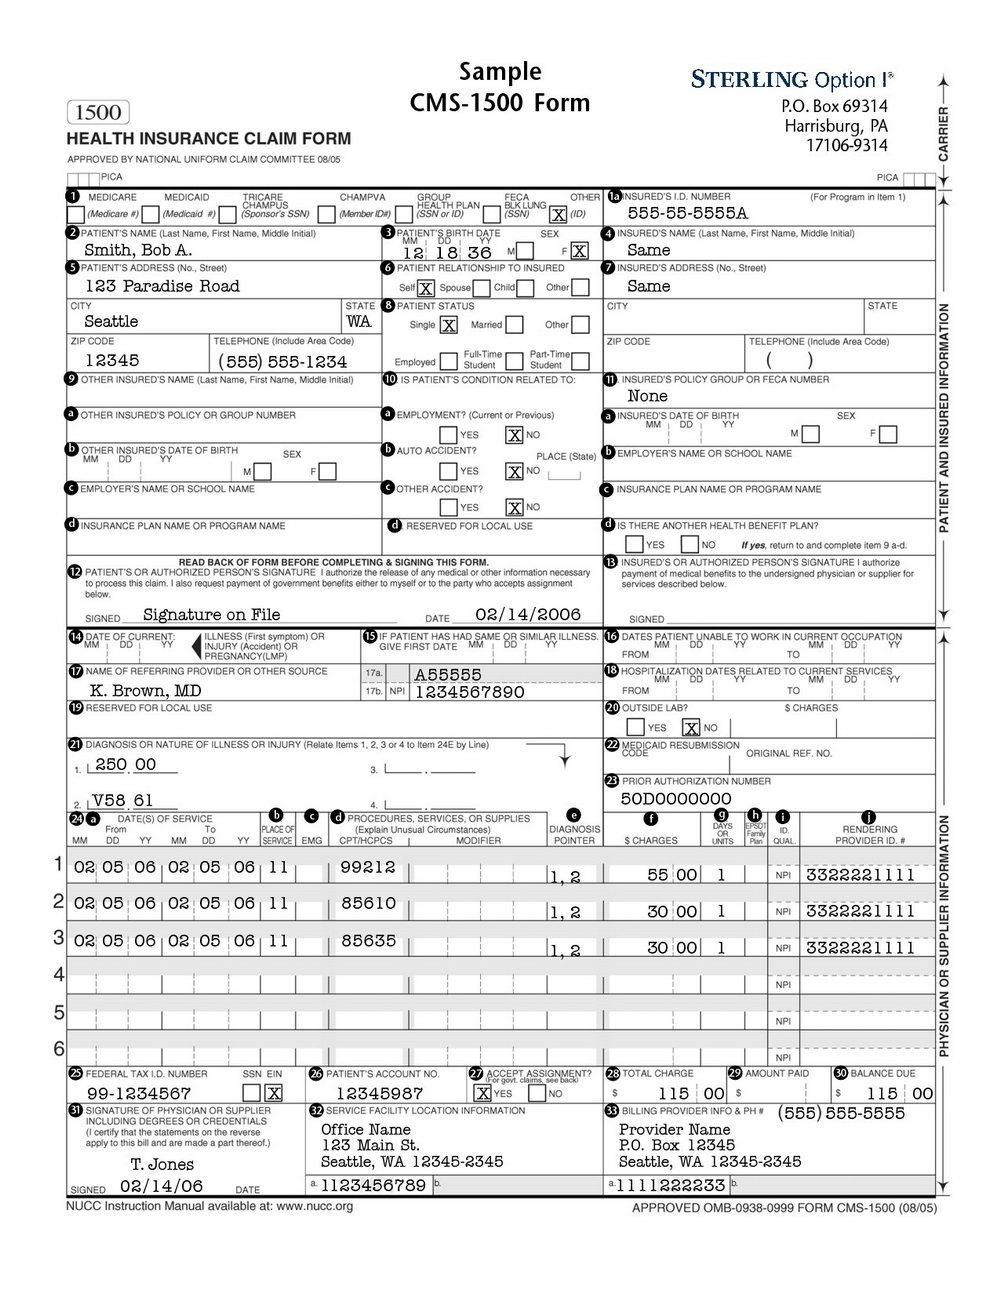 Cms 1500 Claim Form 08 05